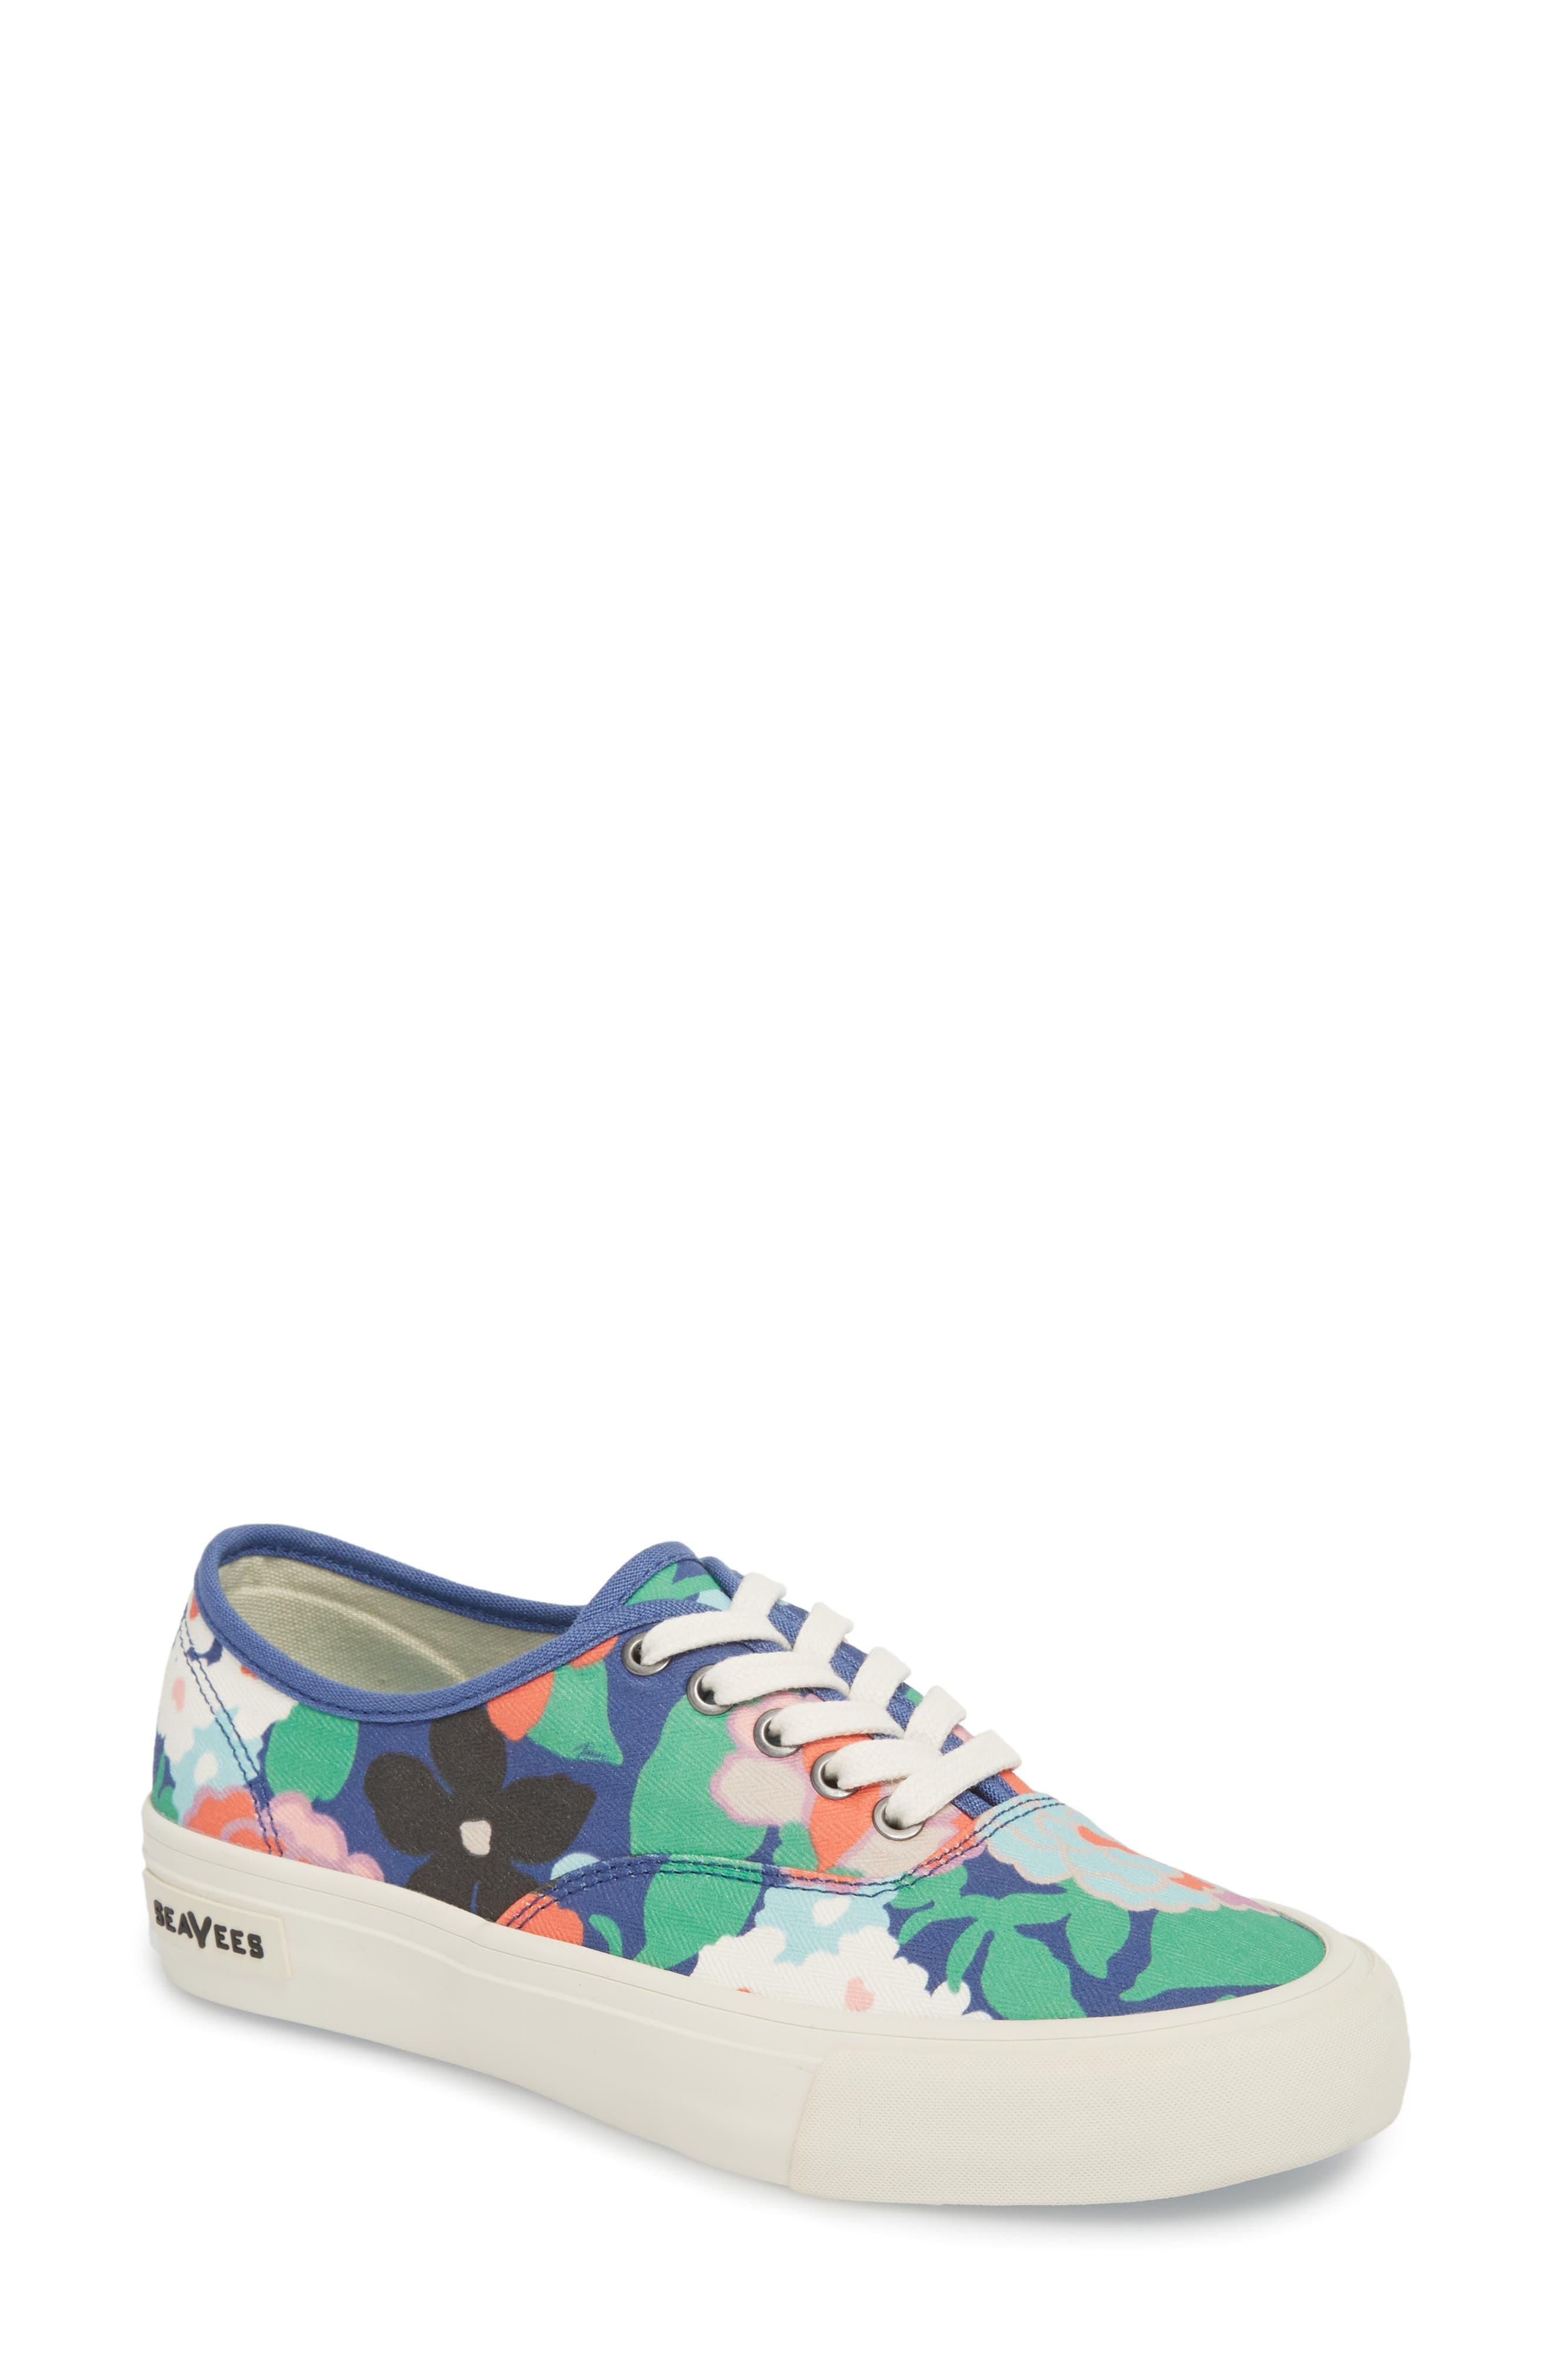 x Trina Turk Legend Sneaker,                             Main thumbnail 1, color,                             Greenhouse Floral